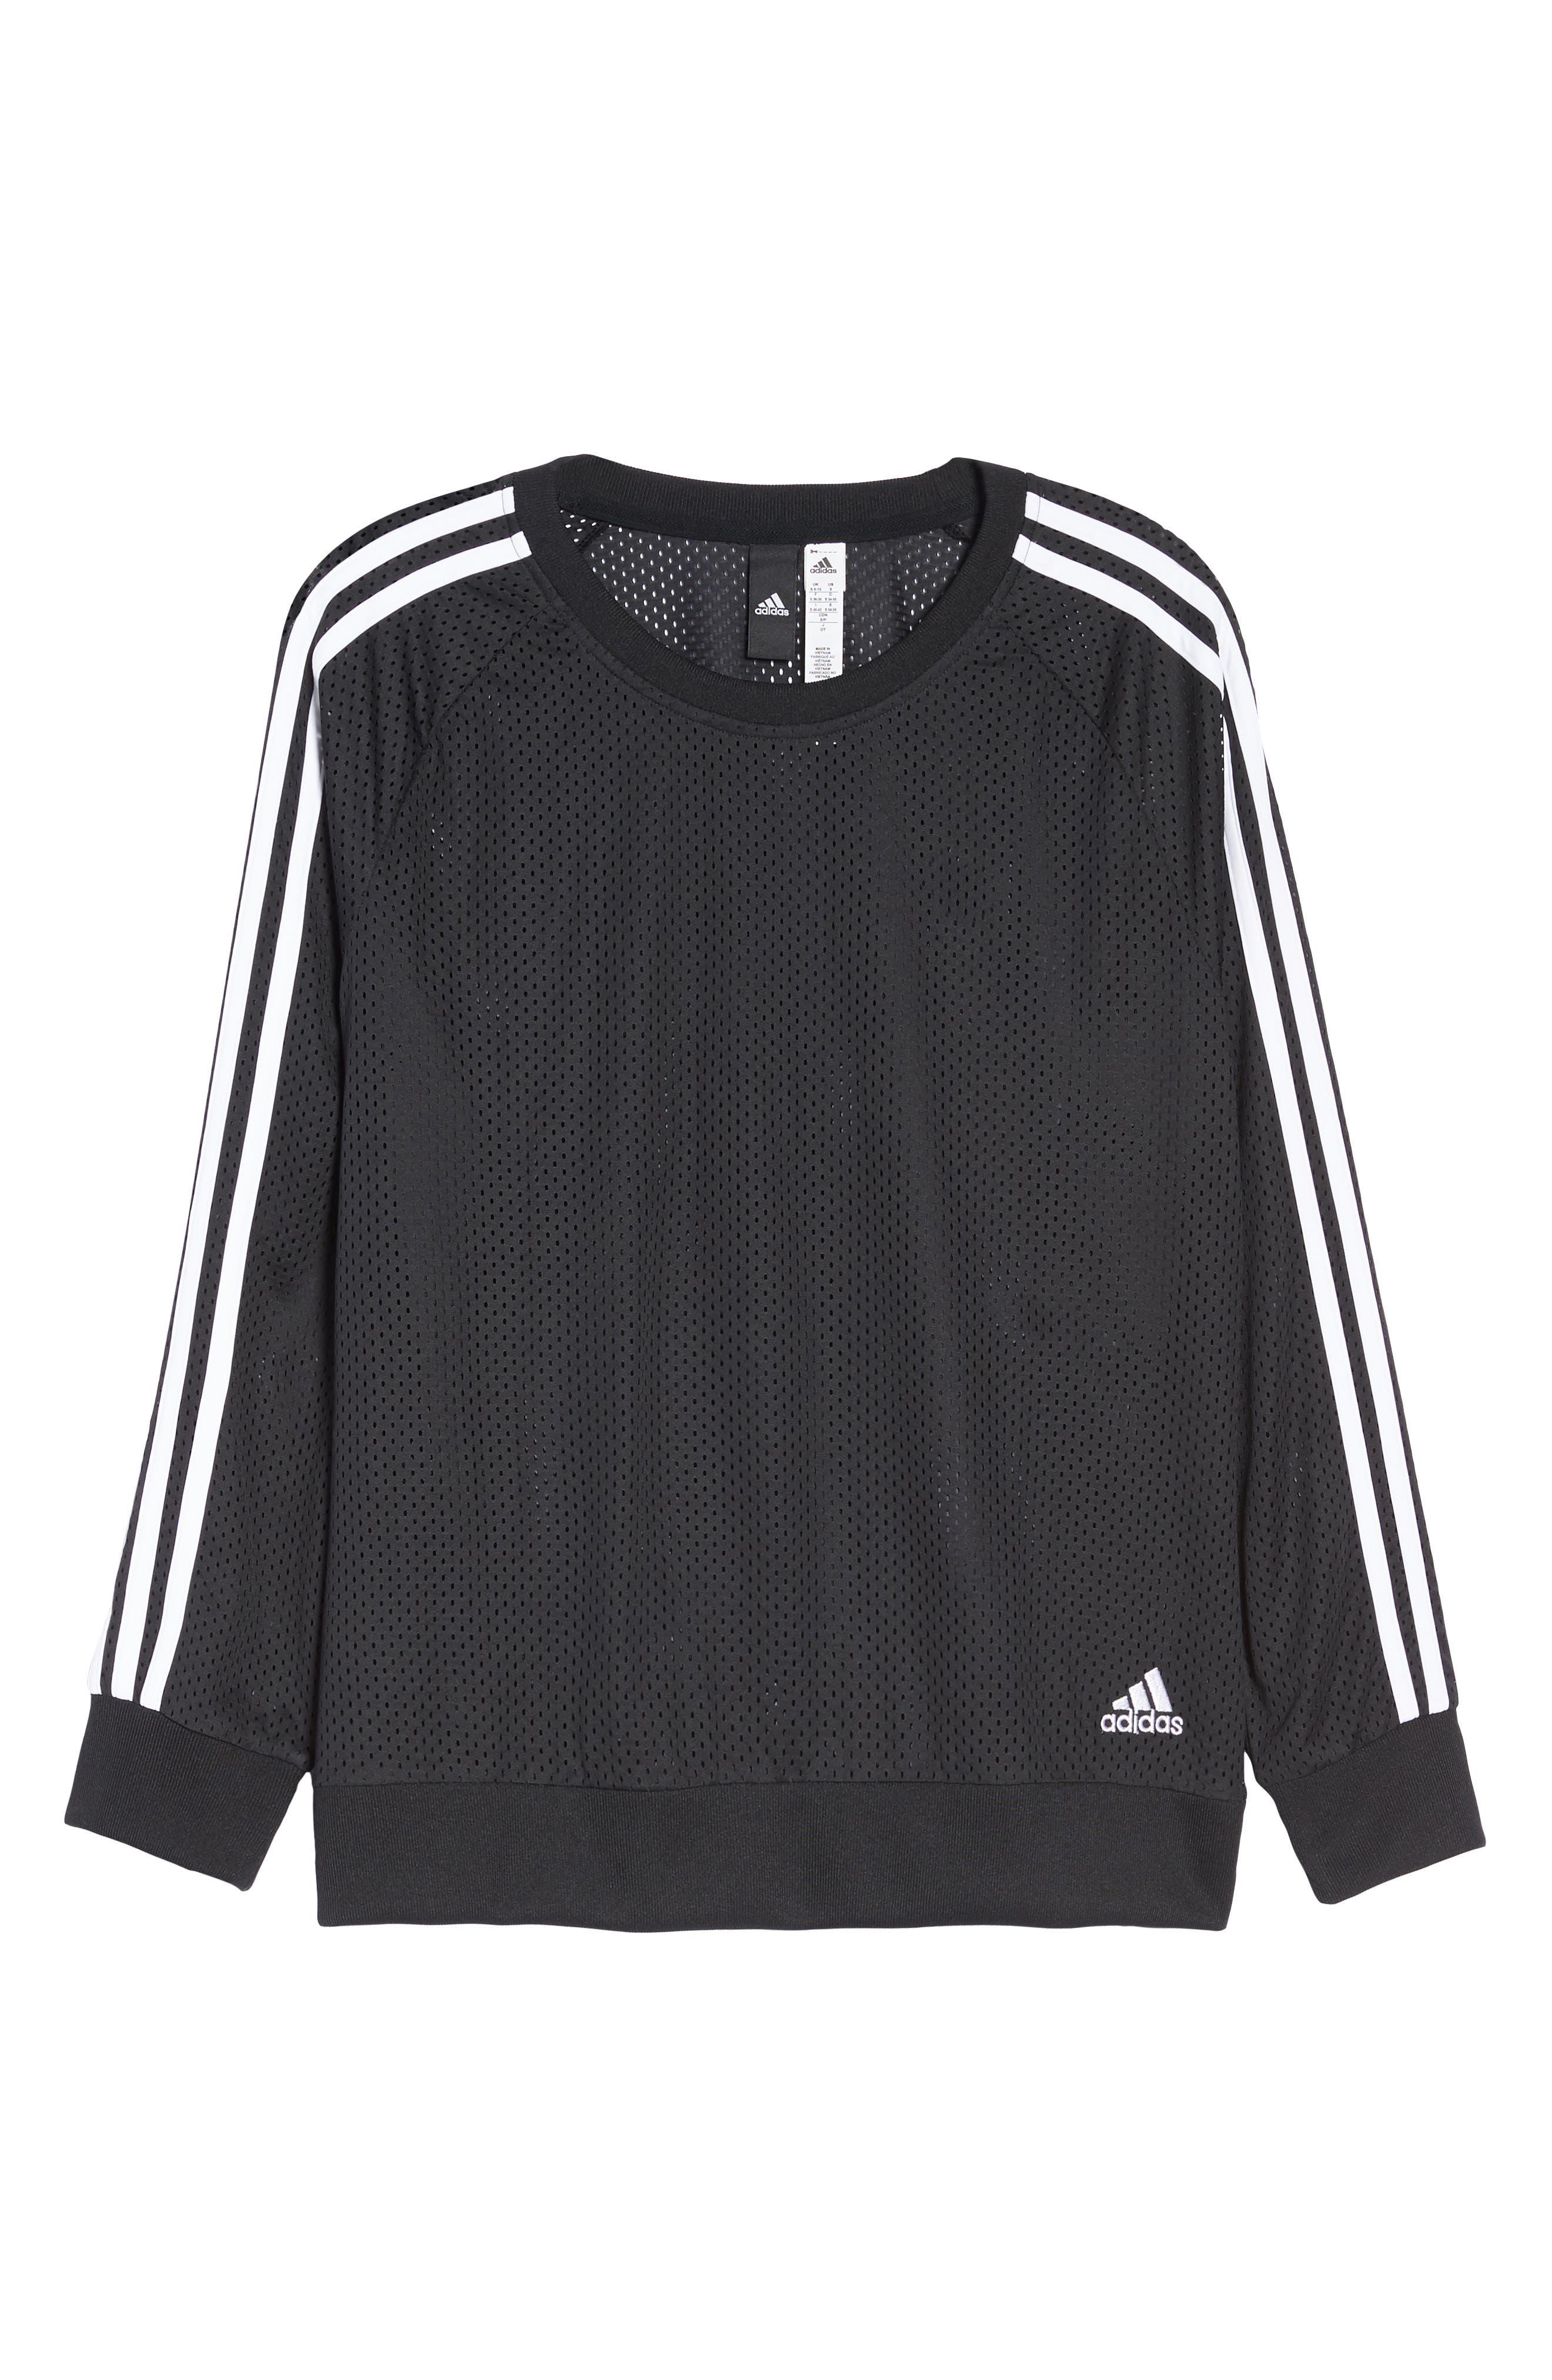 Essentials Mesh Sweatshirt,                             Alternate thumbnail 7, color,                             Black